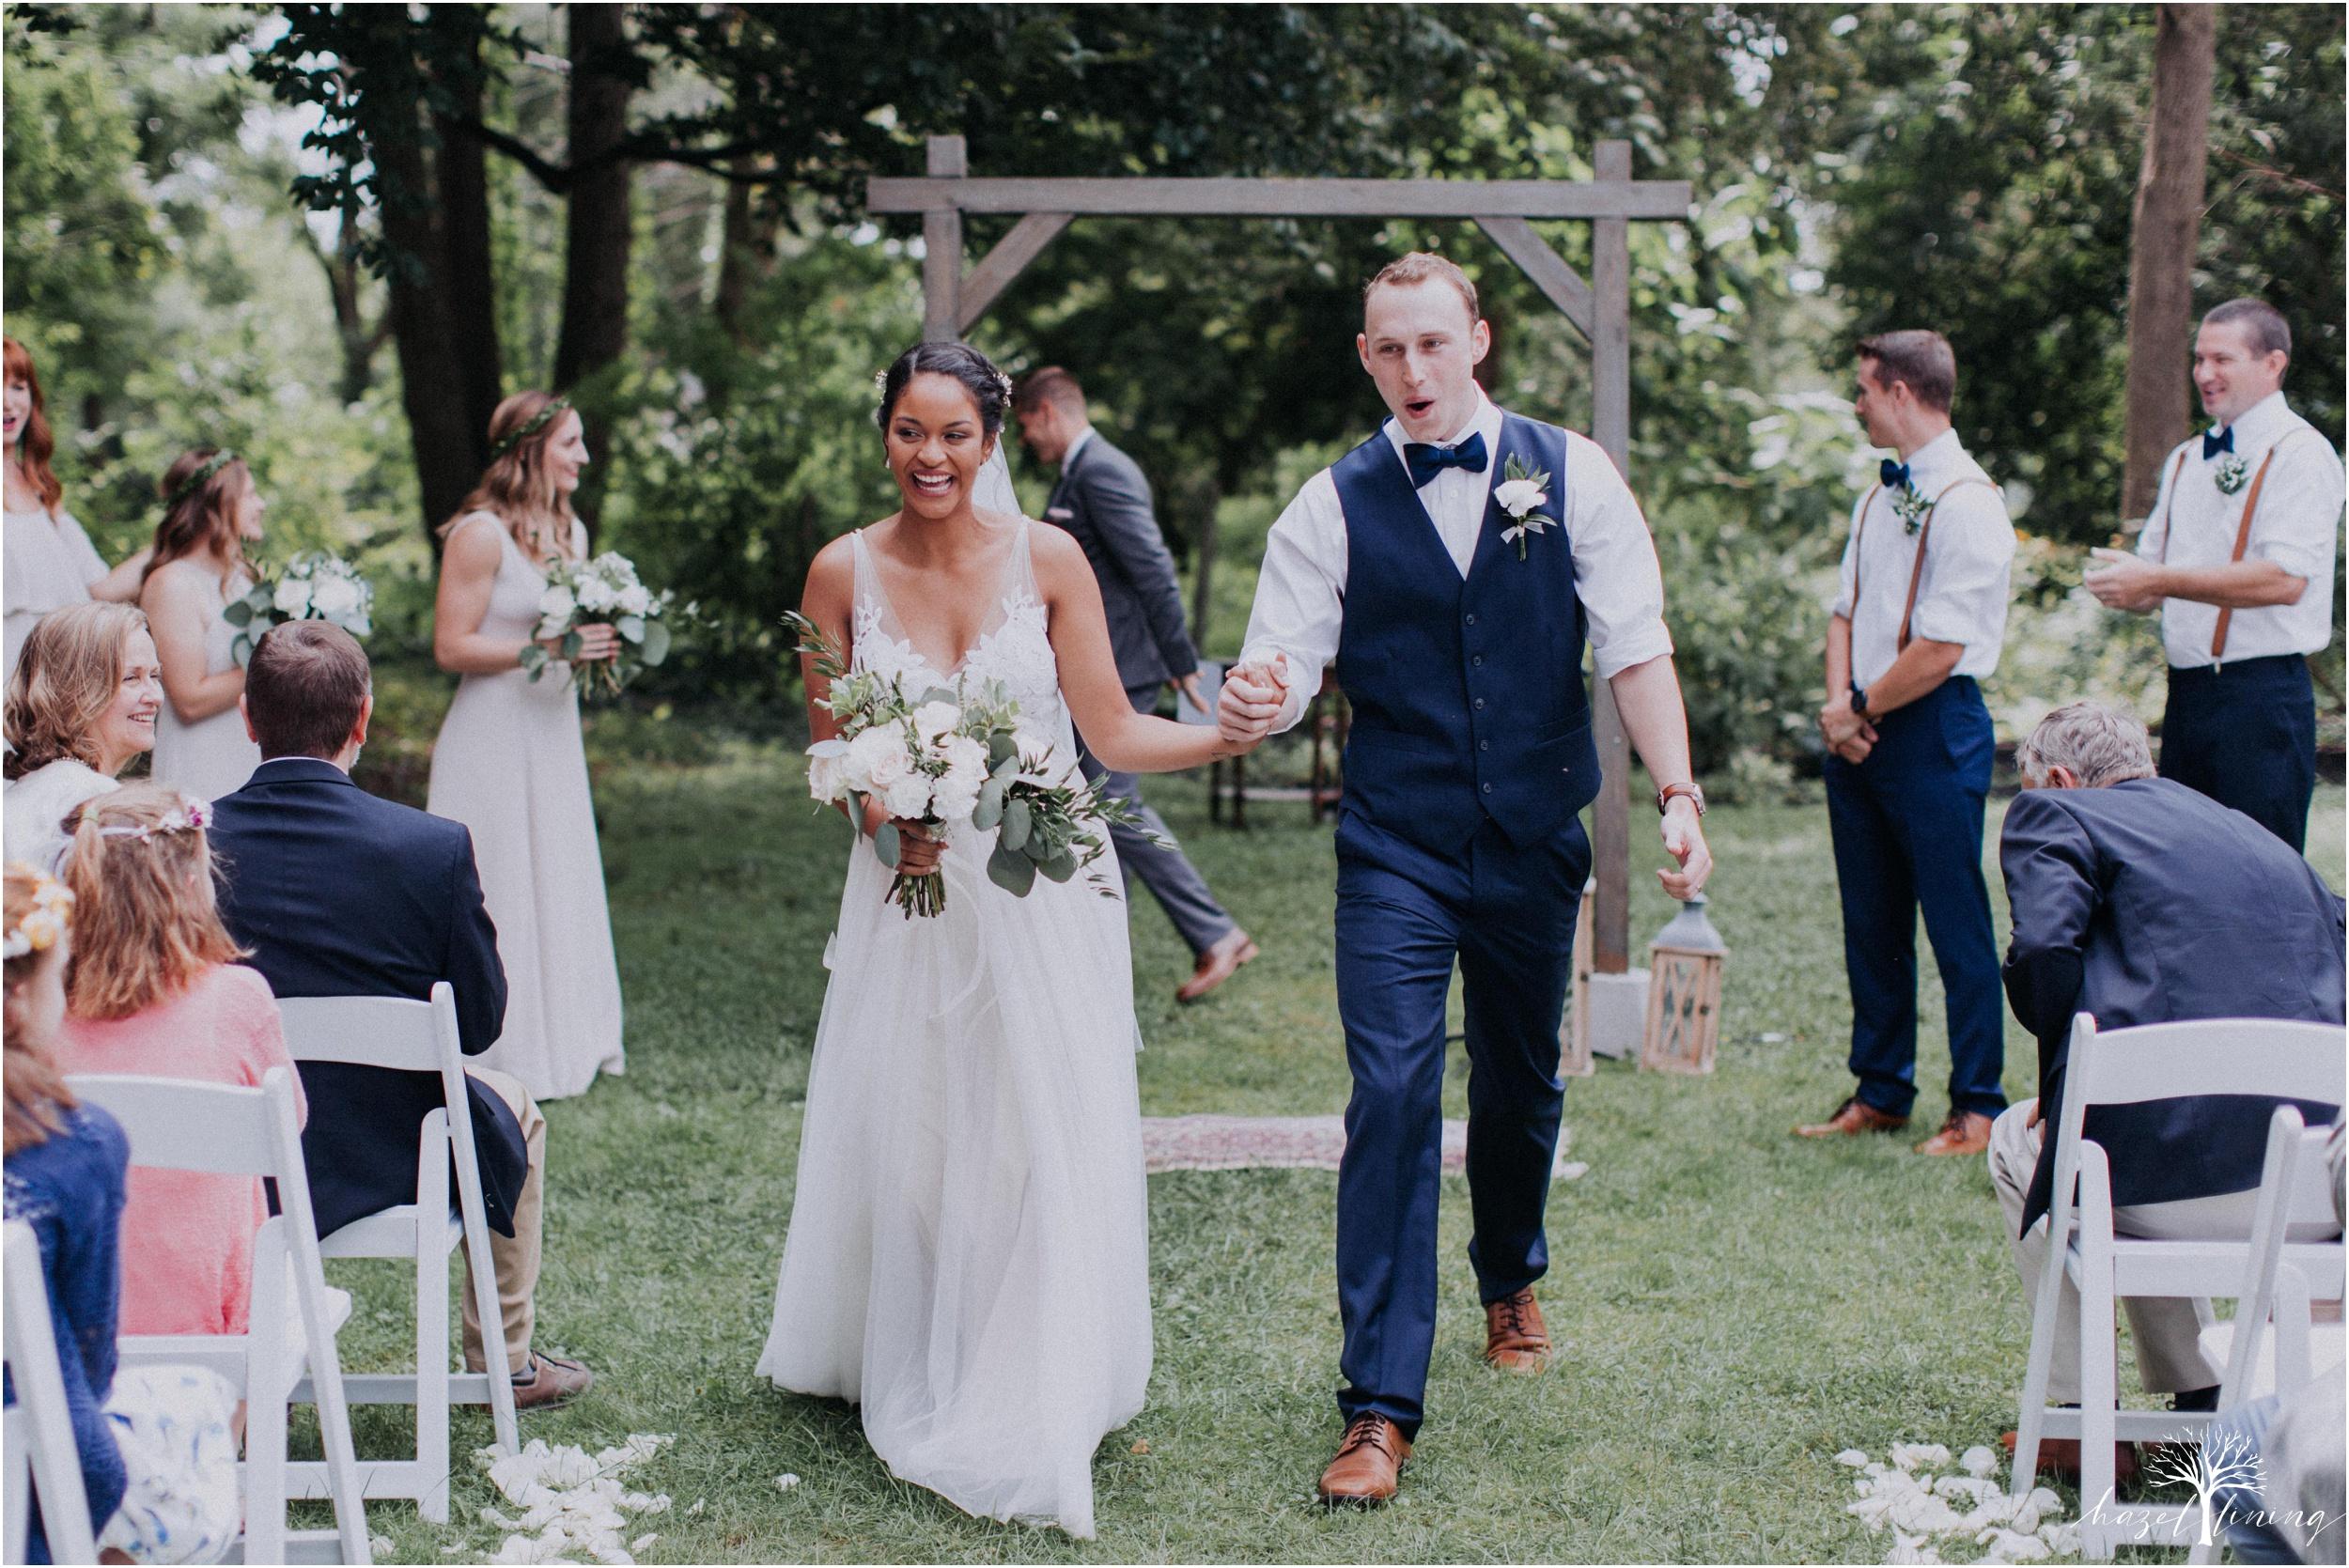 mariah-kreyling-samuel-sherratt-sherrattwiththeworld-peirce-farm-at-witch-hill-boston-massachusetts-wedding-photography-hazel-lining-travel-wedding-elopement-photography_0100.jpg